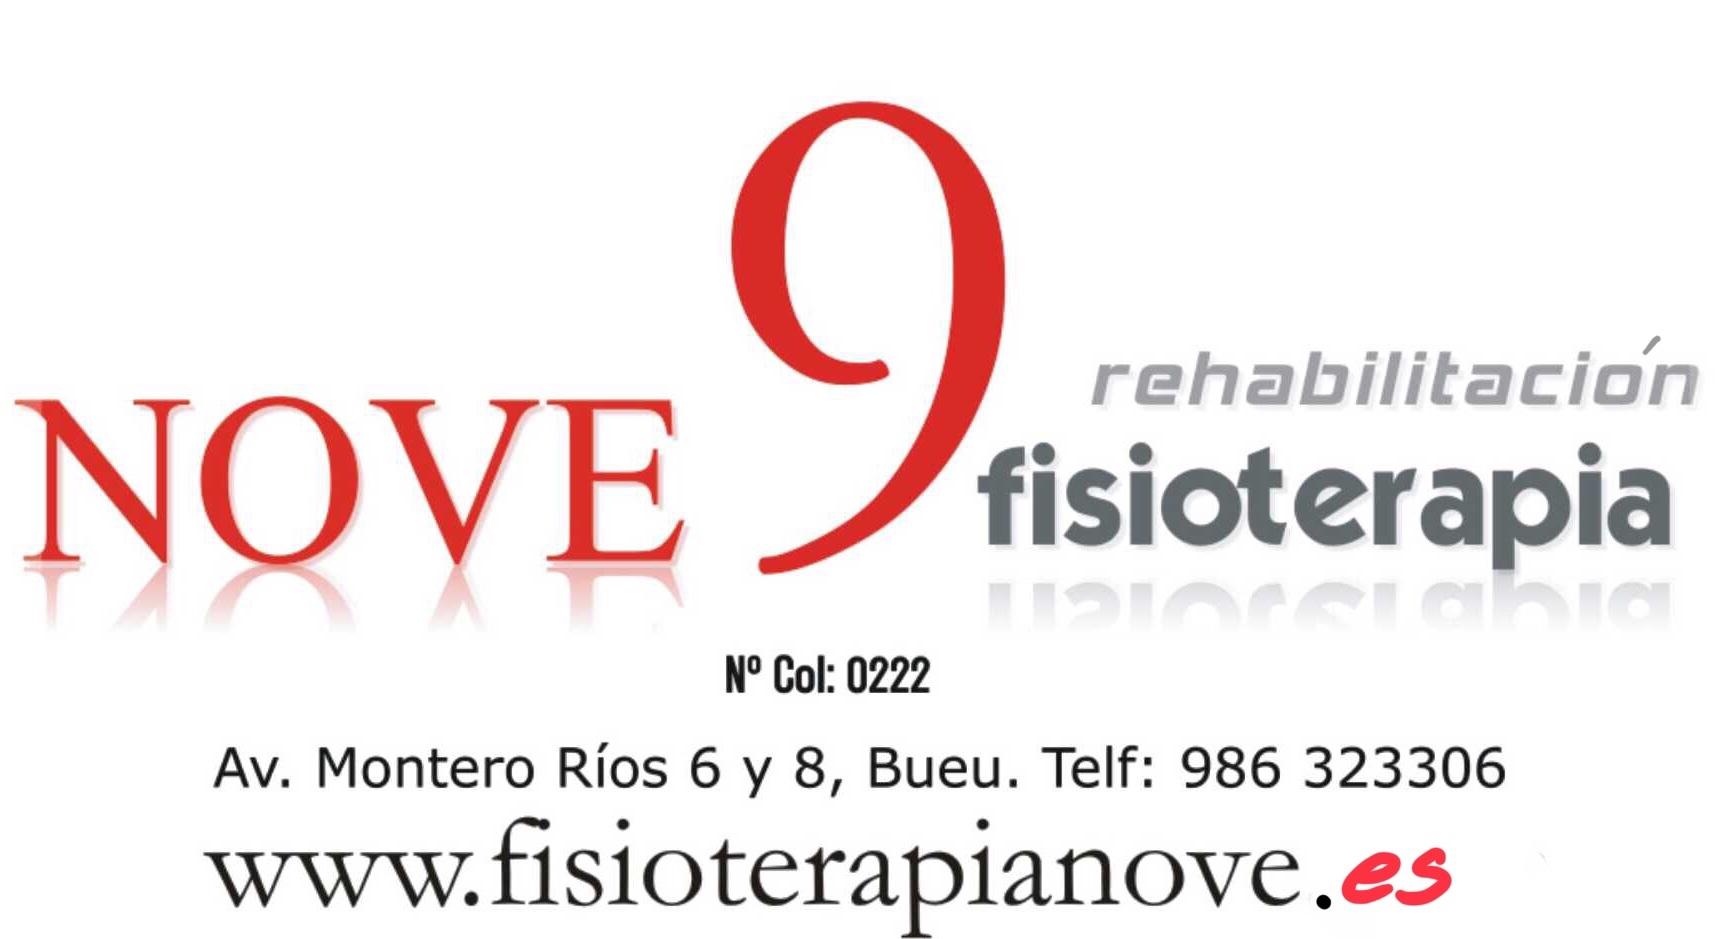 Logotipo CENTRO DE FISIOTERAPIA NOVE